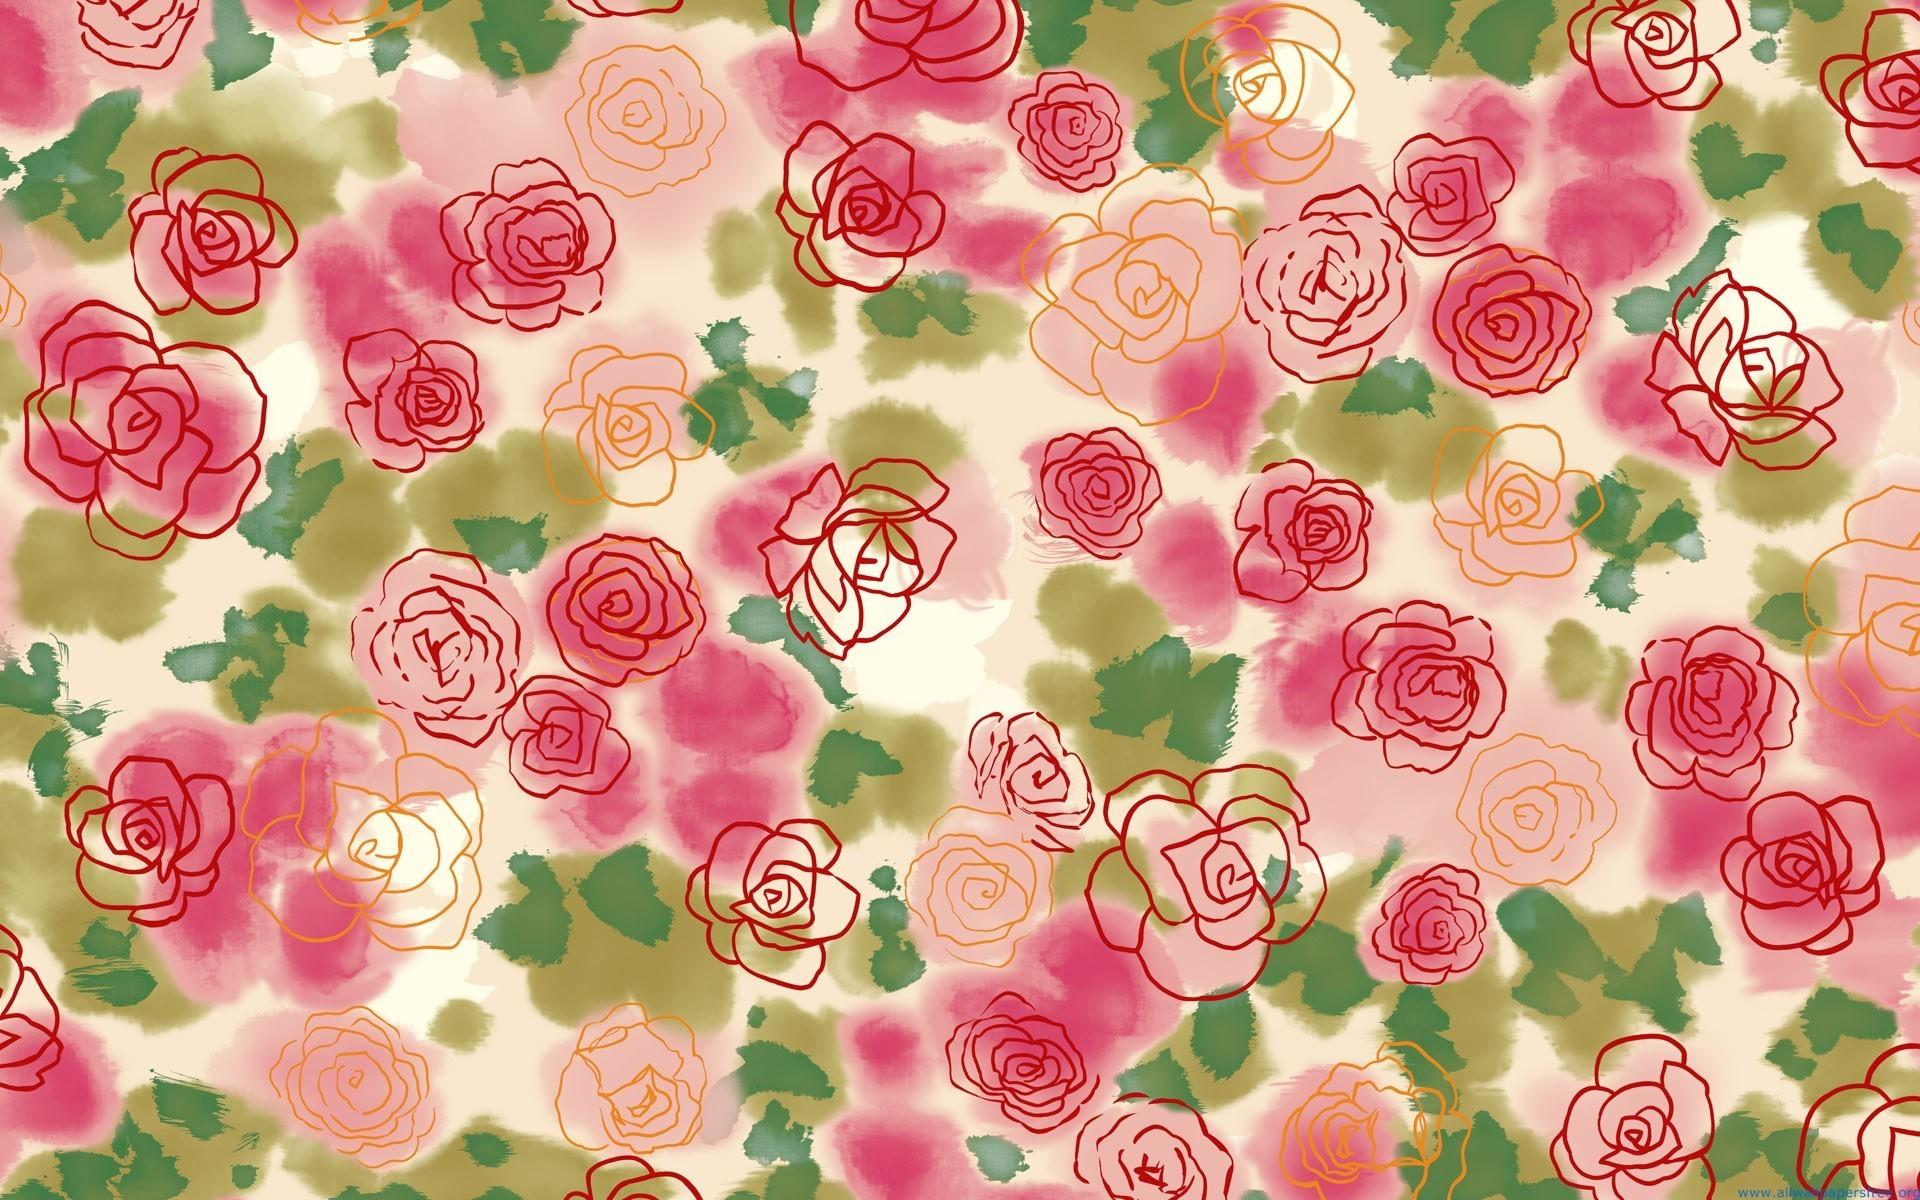 Valentine Wallpapers For Desktop 59 Pictures